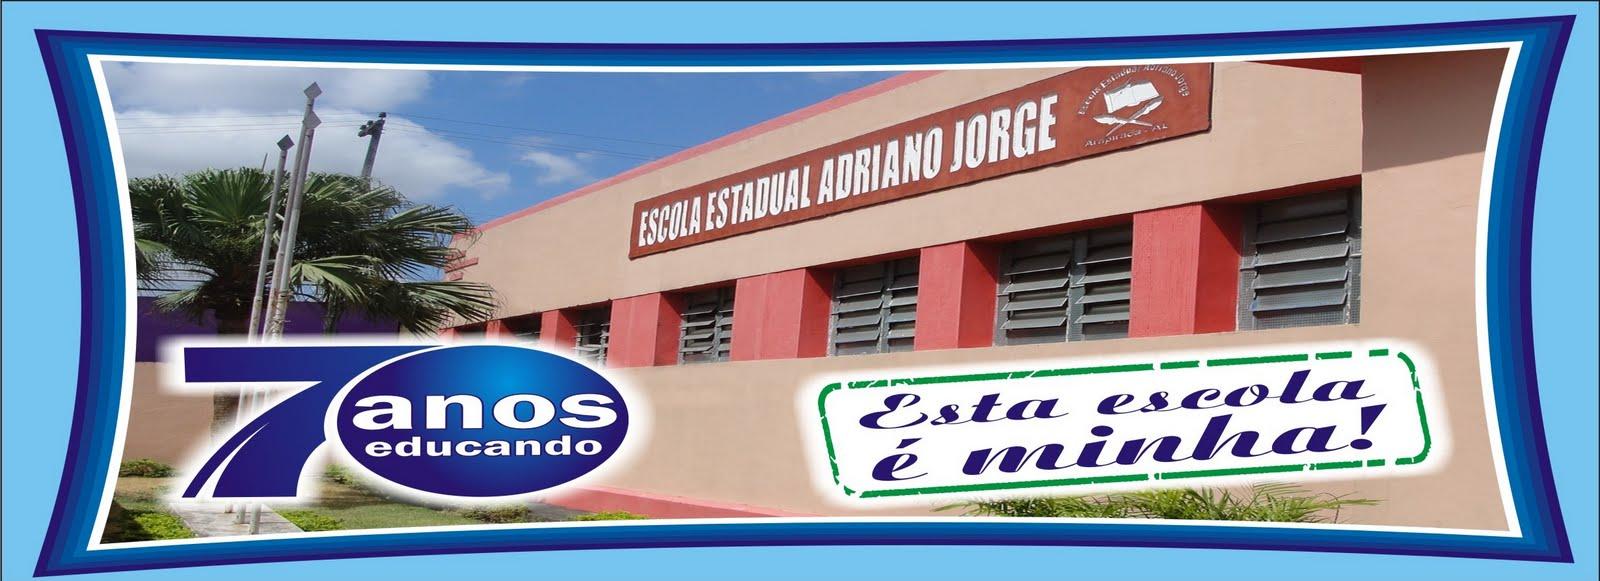 Escola Estadual Adriano Jorge - 70 anos